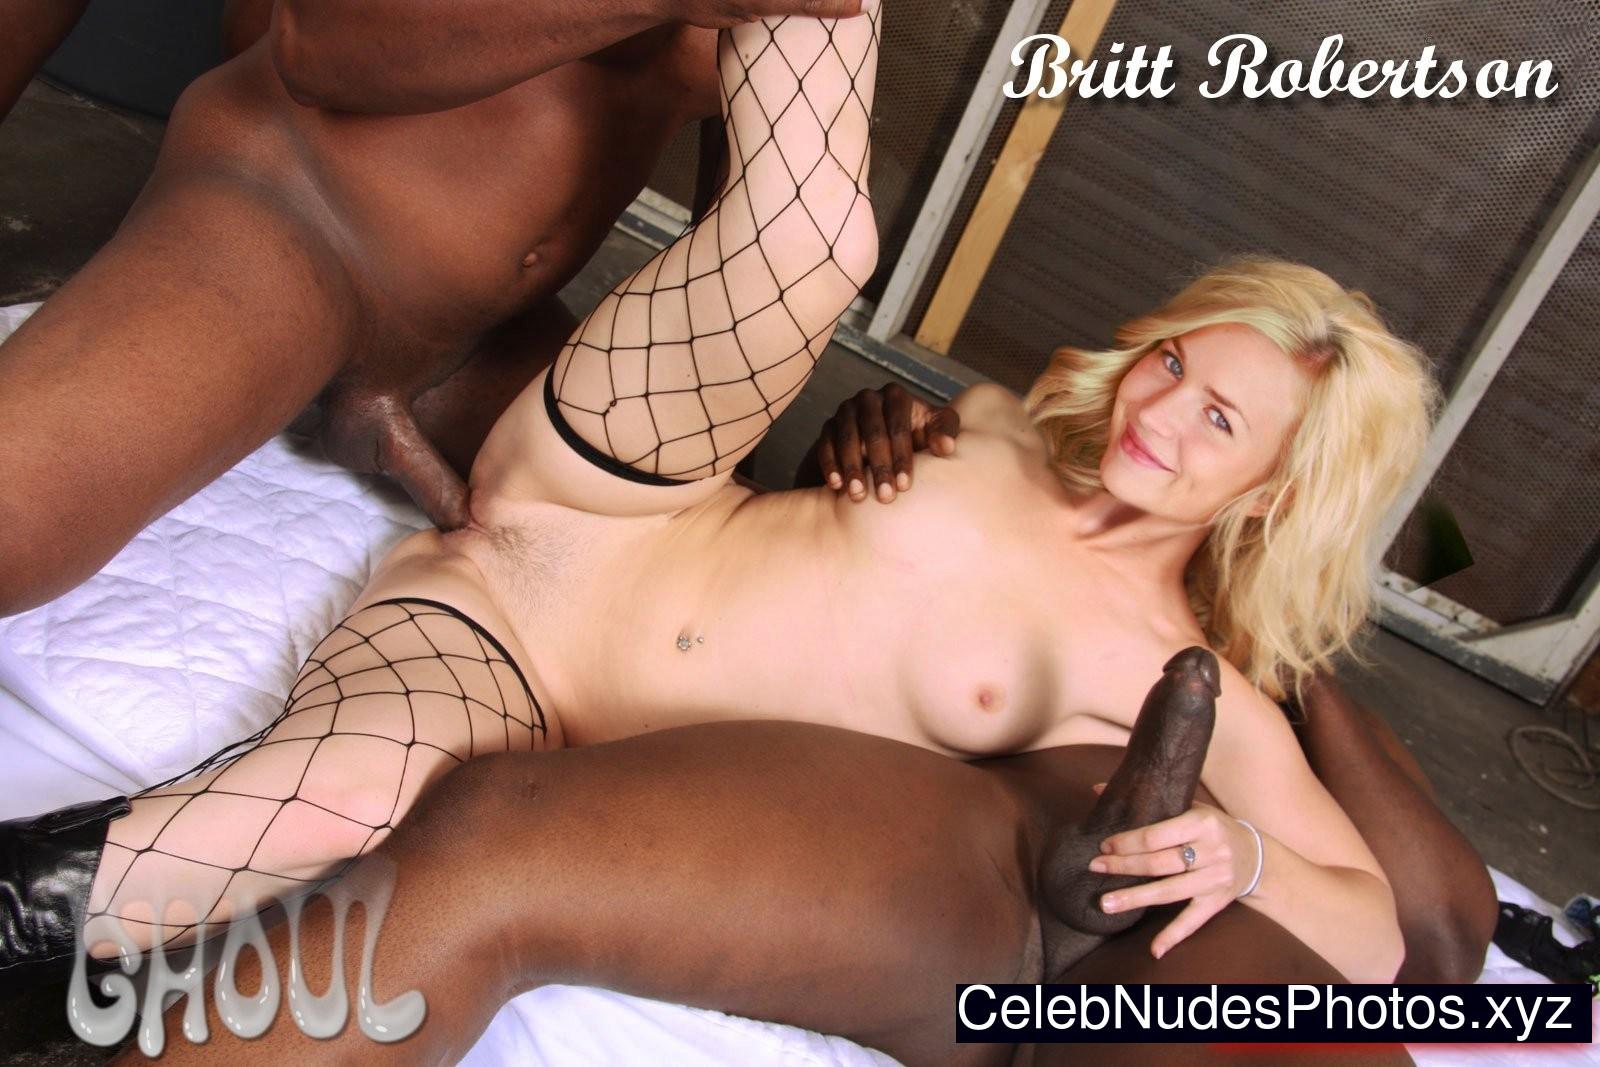 Britt robertson nue